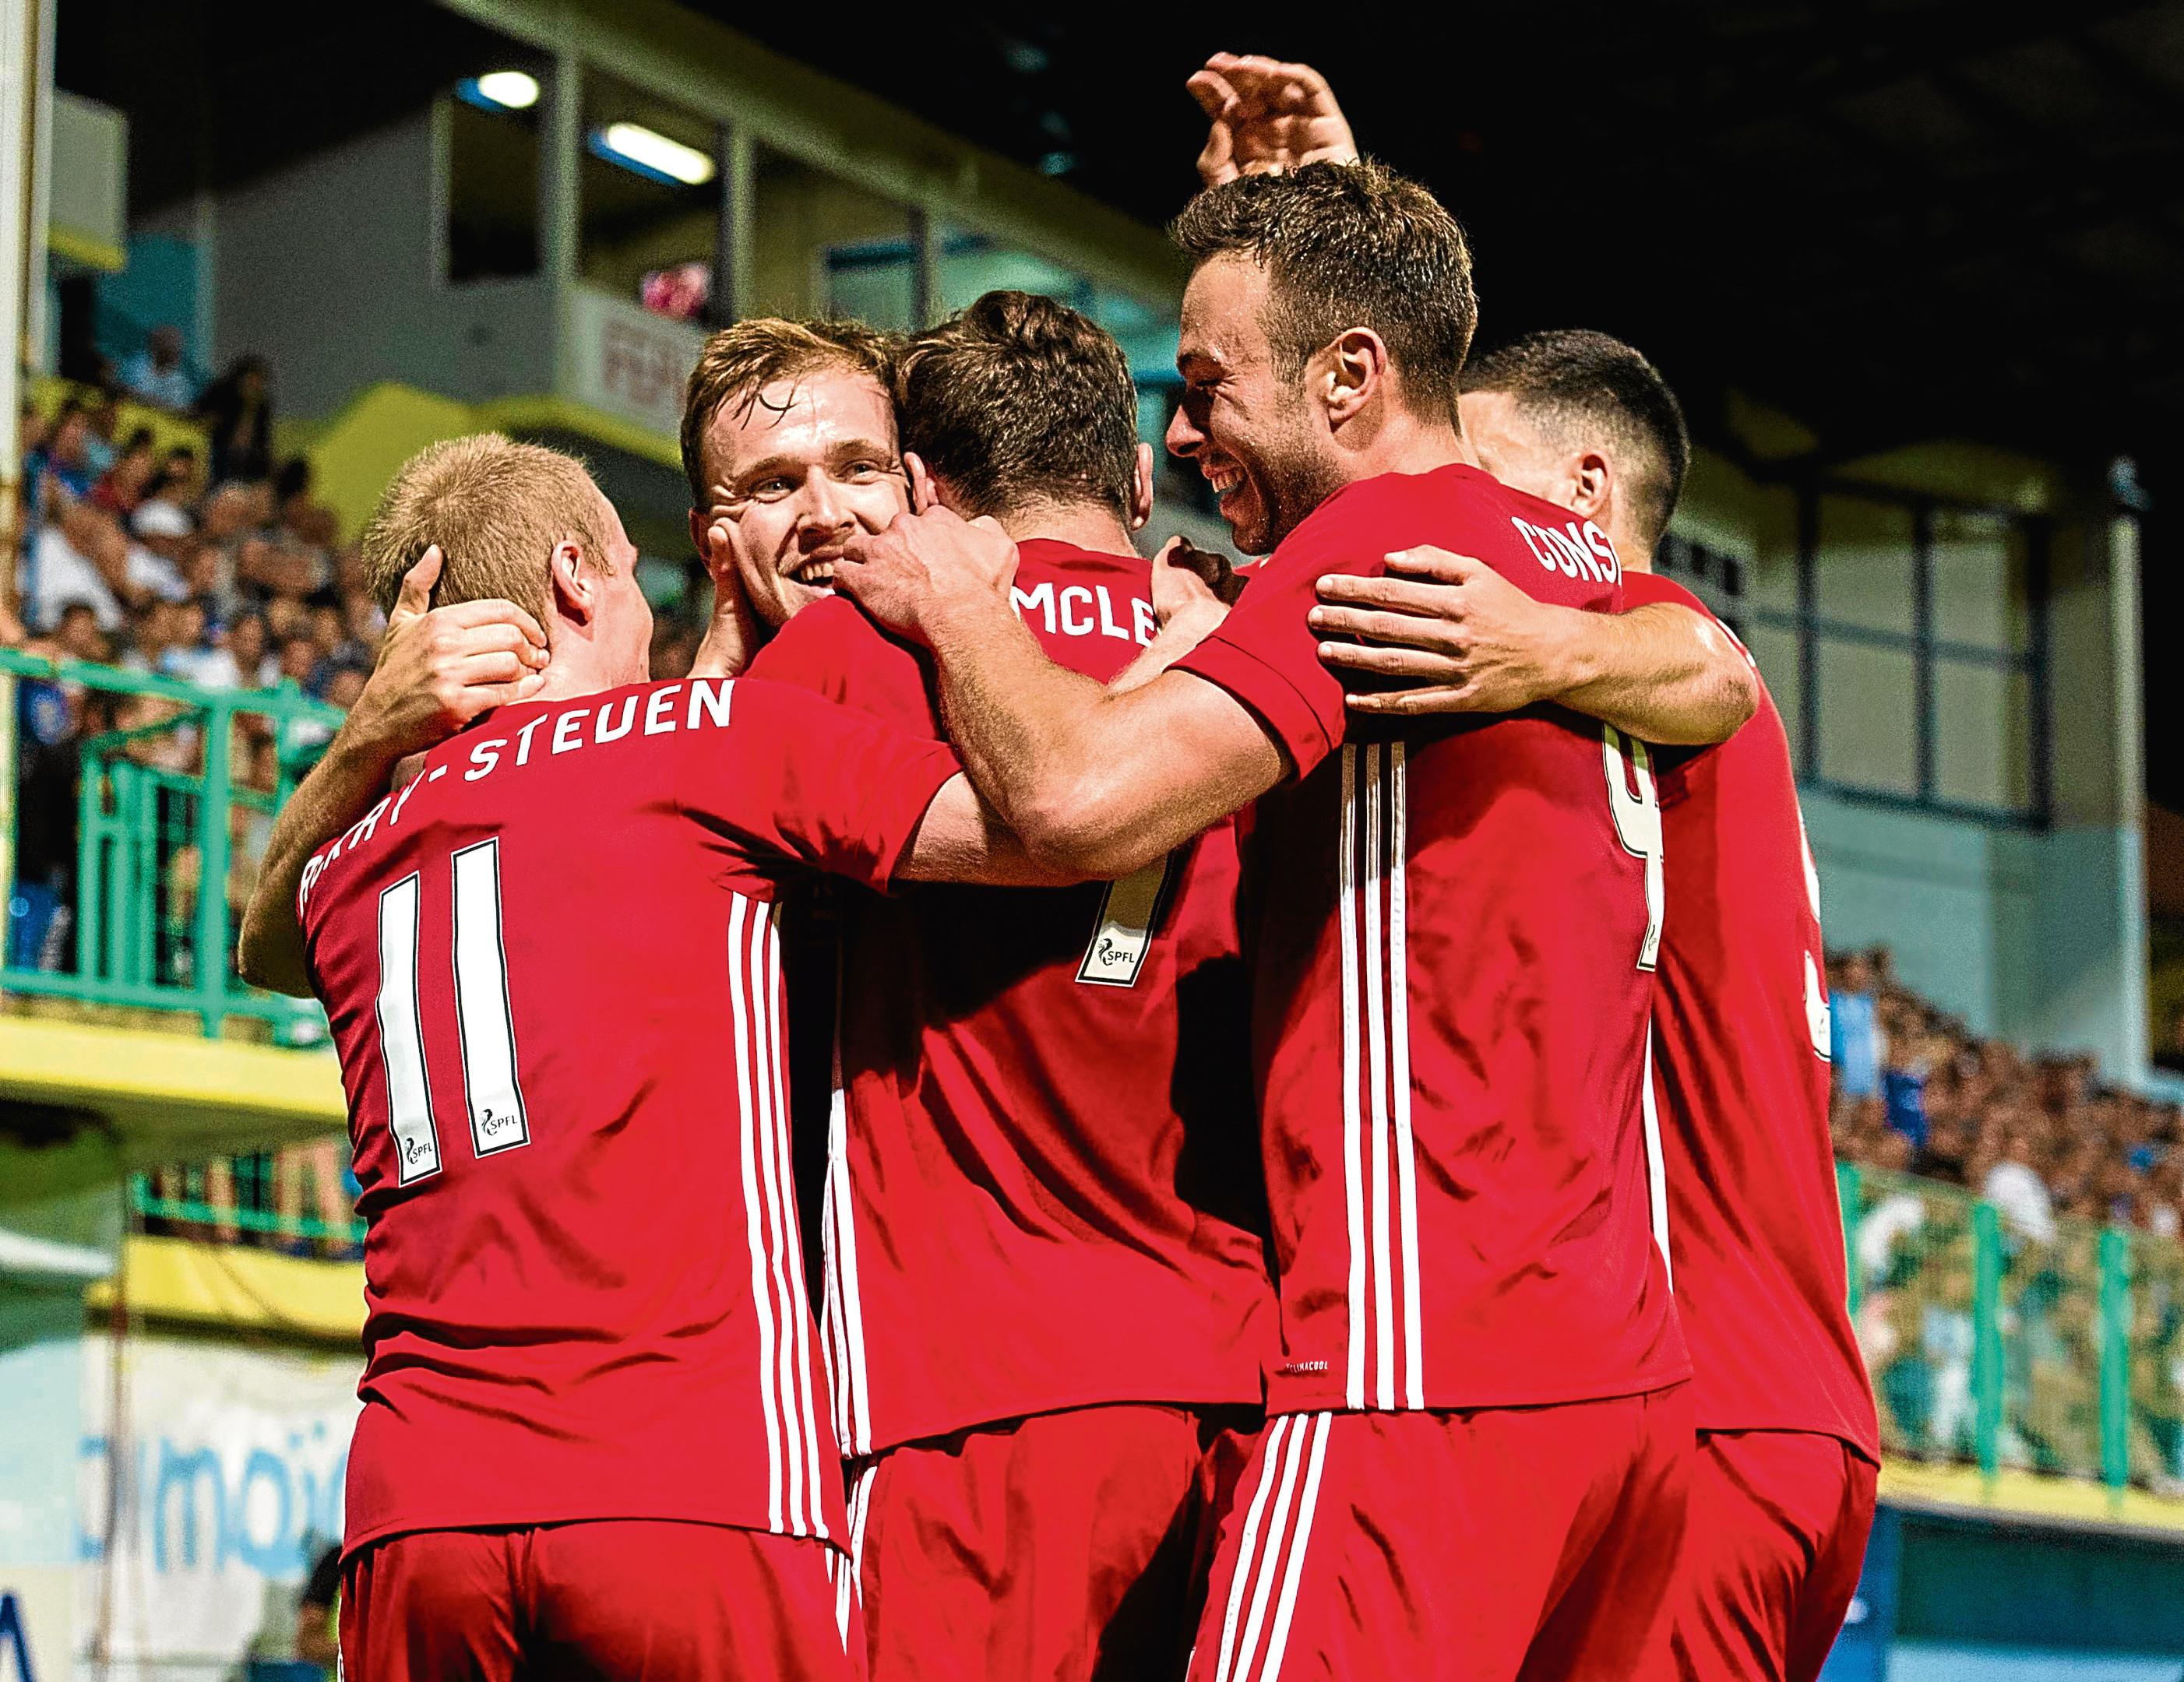 Aberdeen's Greg Stewart (second from left) celebrates his goal with his team-mates against Siroki Brijeg.